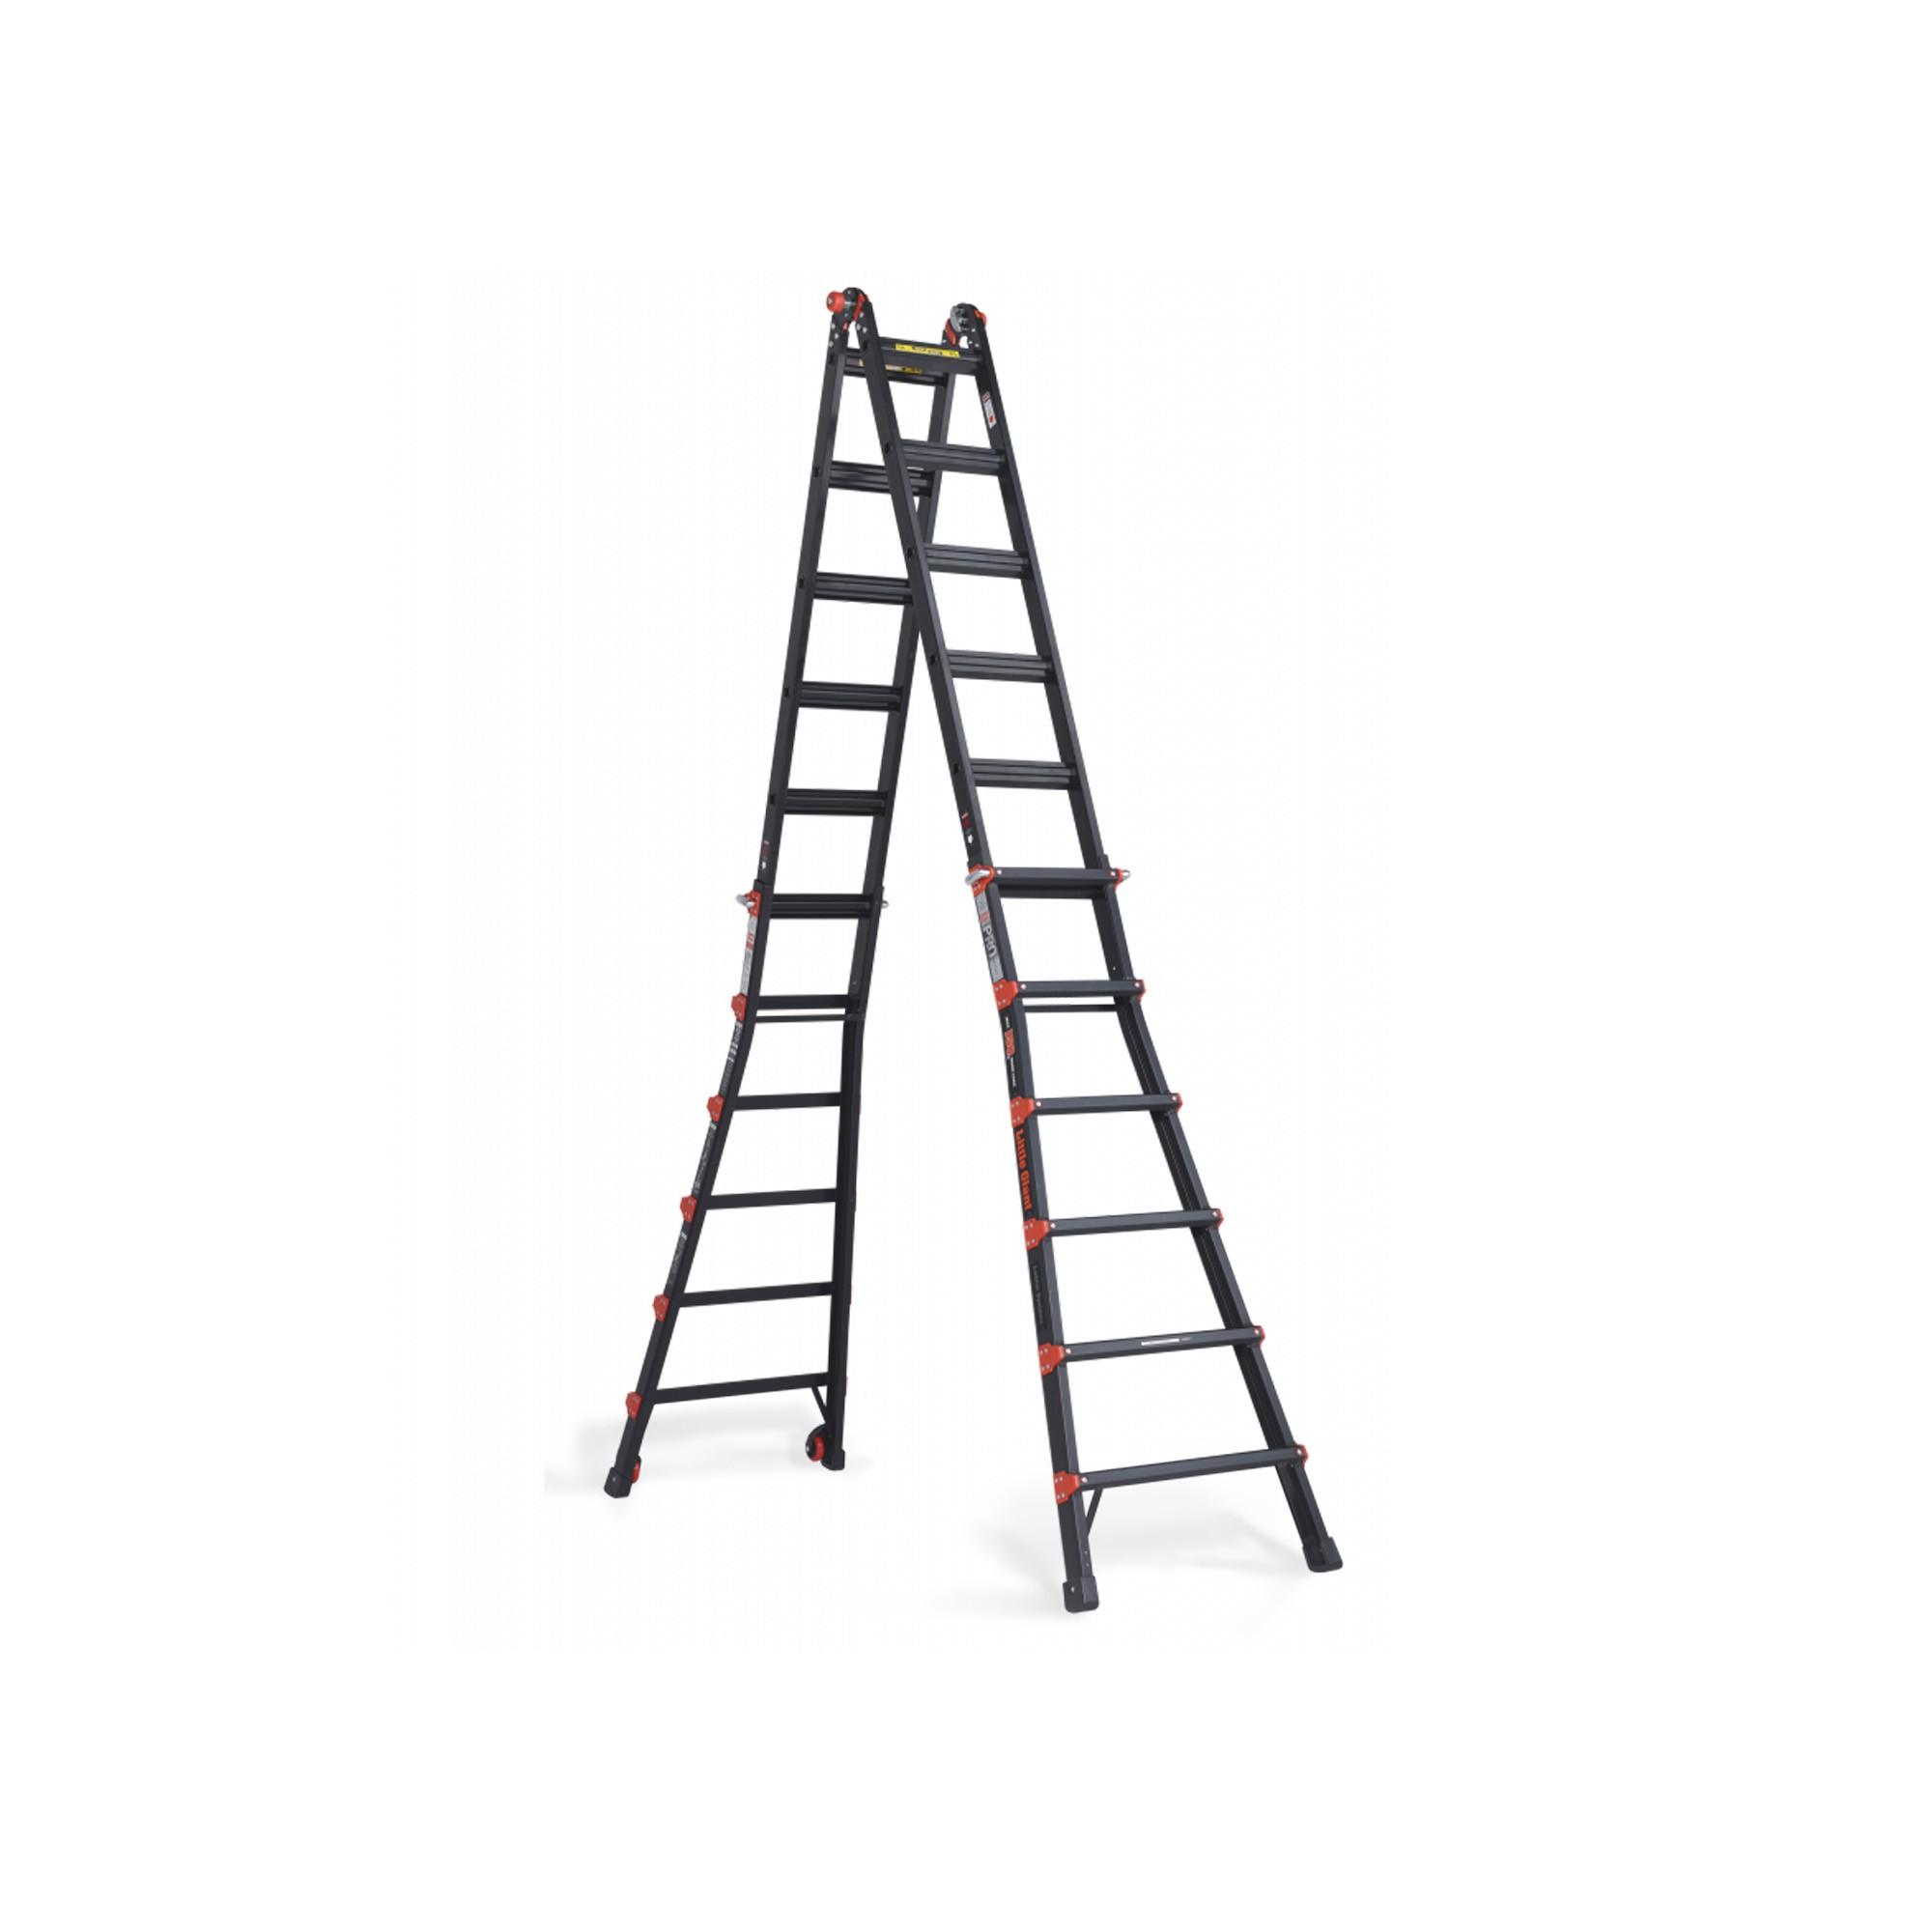 Altrex Black Folding ladder available to rent / verhuur / location at 50.8 Studio • Belgïe, Belgique, Belgium, Grip, Huur, Location, Louer, Manfrotto, Only in, Photo, Rent, Rental, Stand, Studio, Verhuur, Video